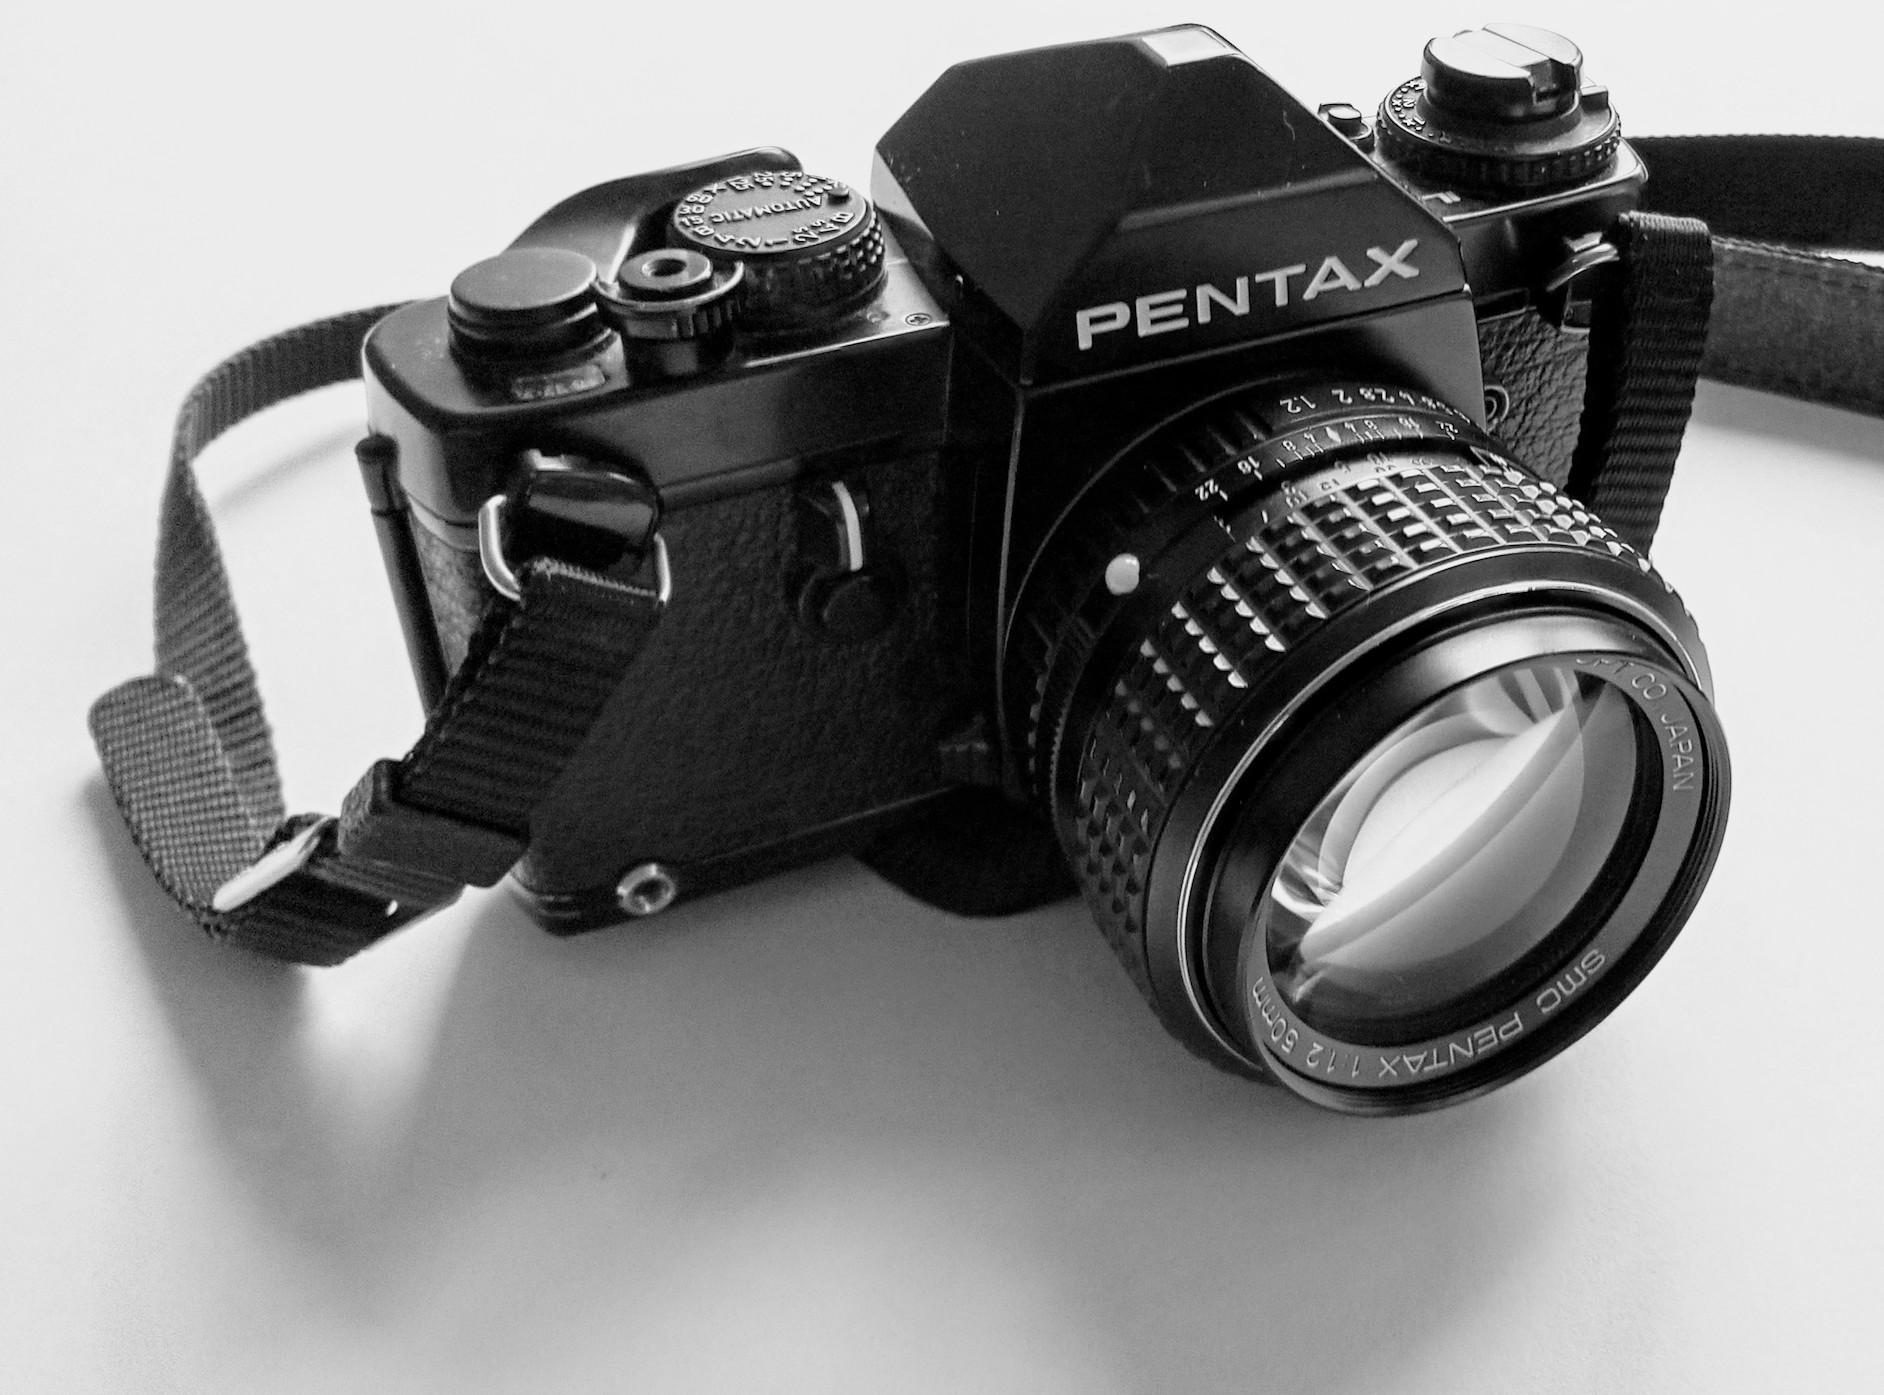 Pentax LX analog camera review